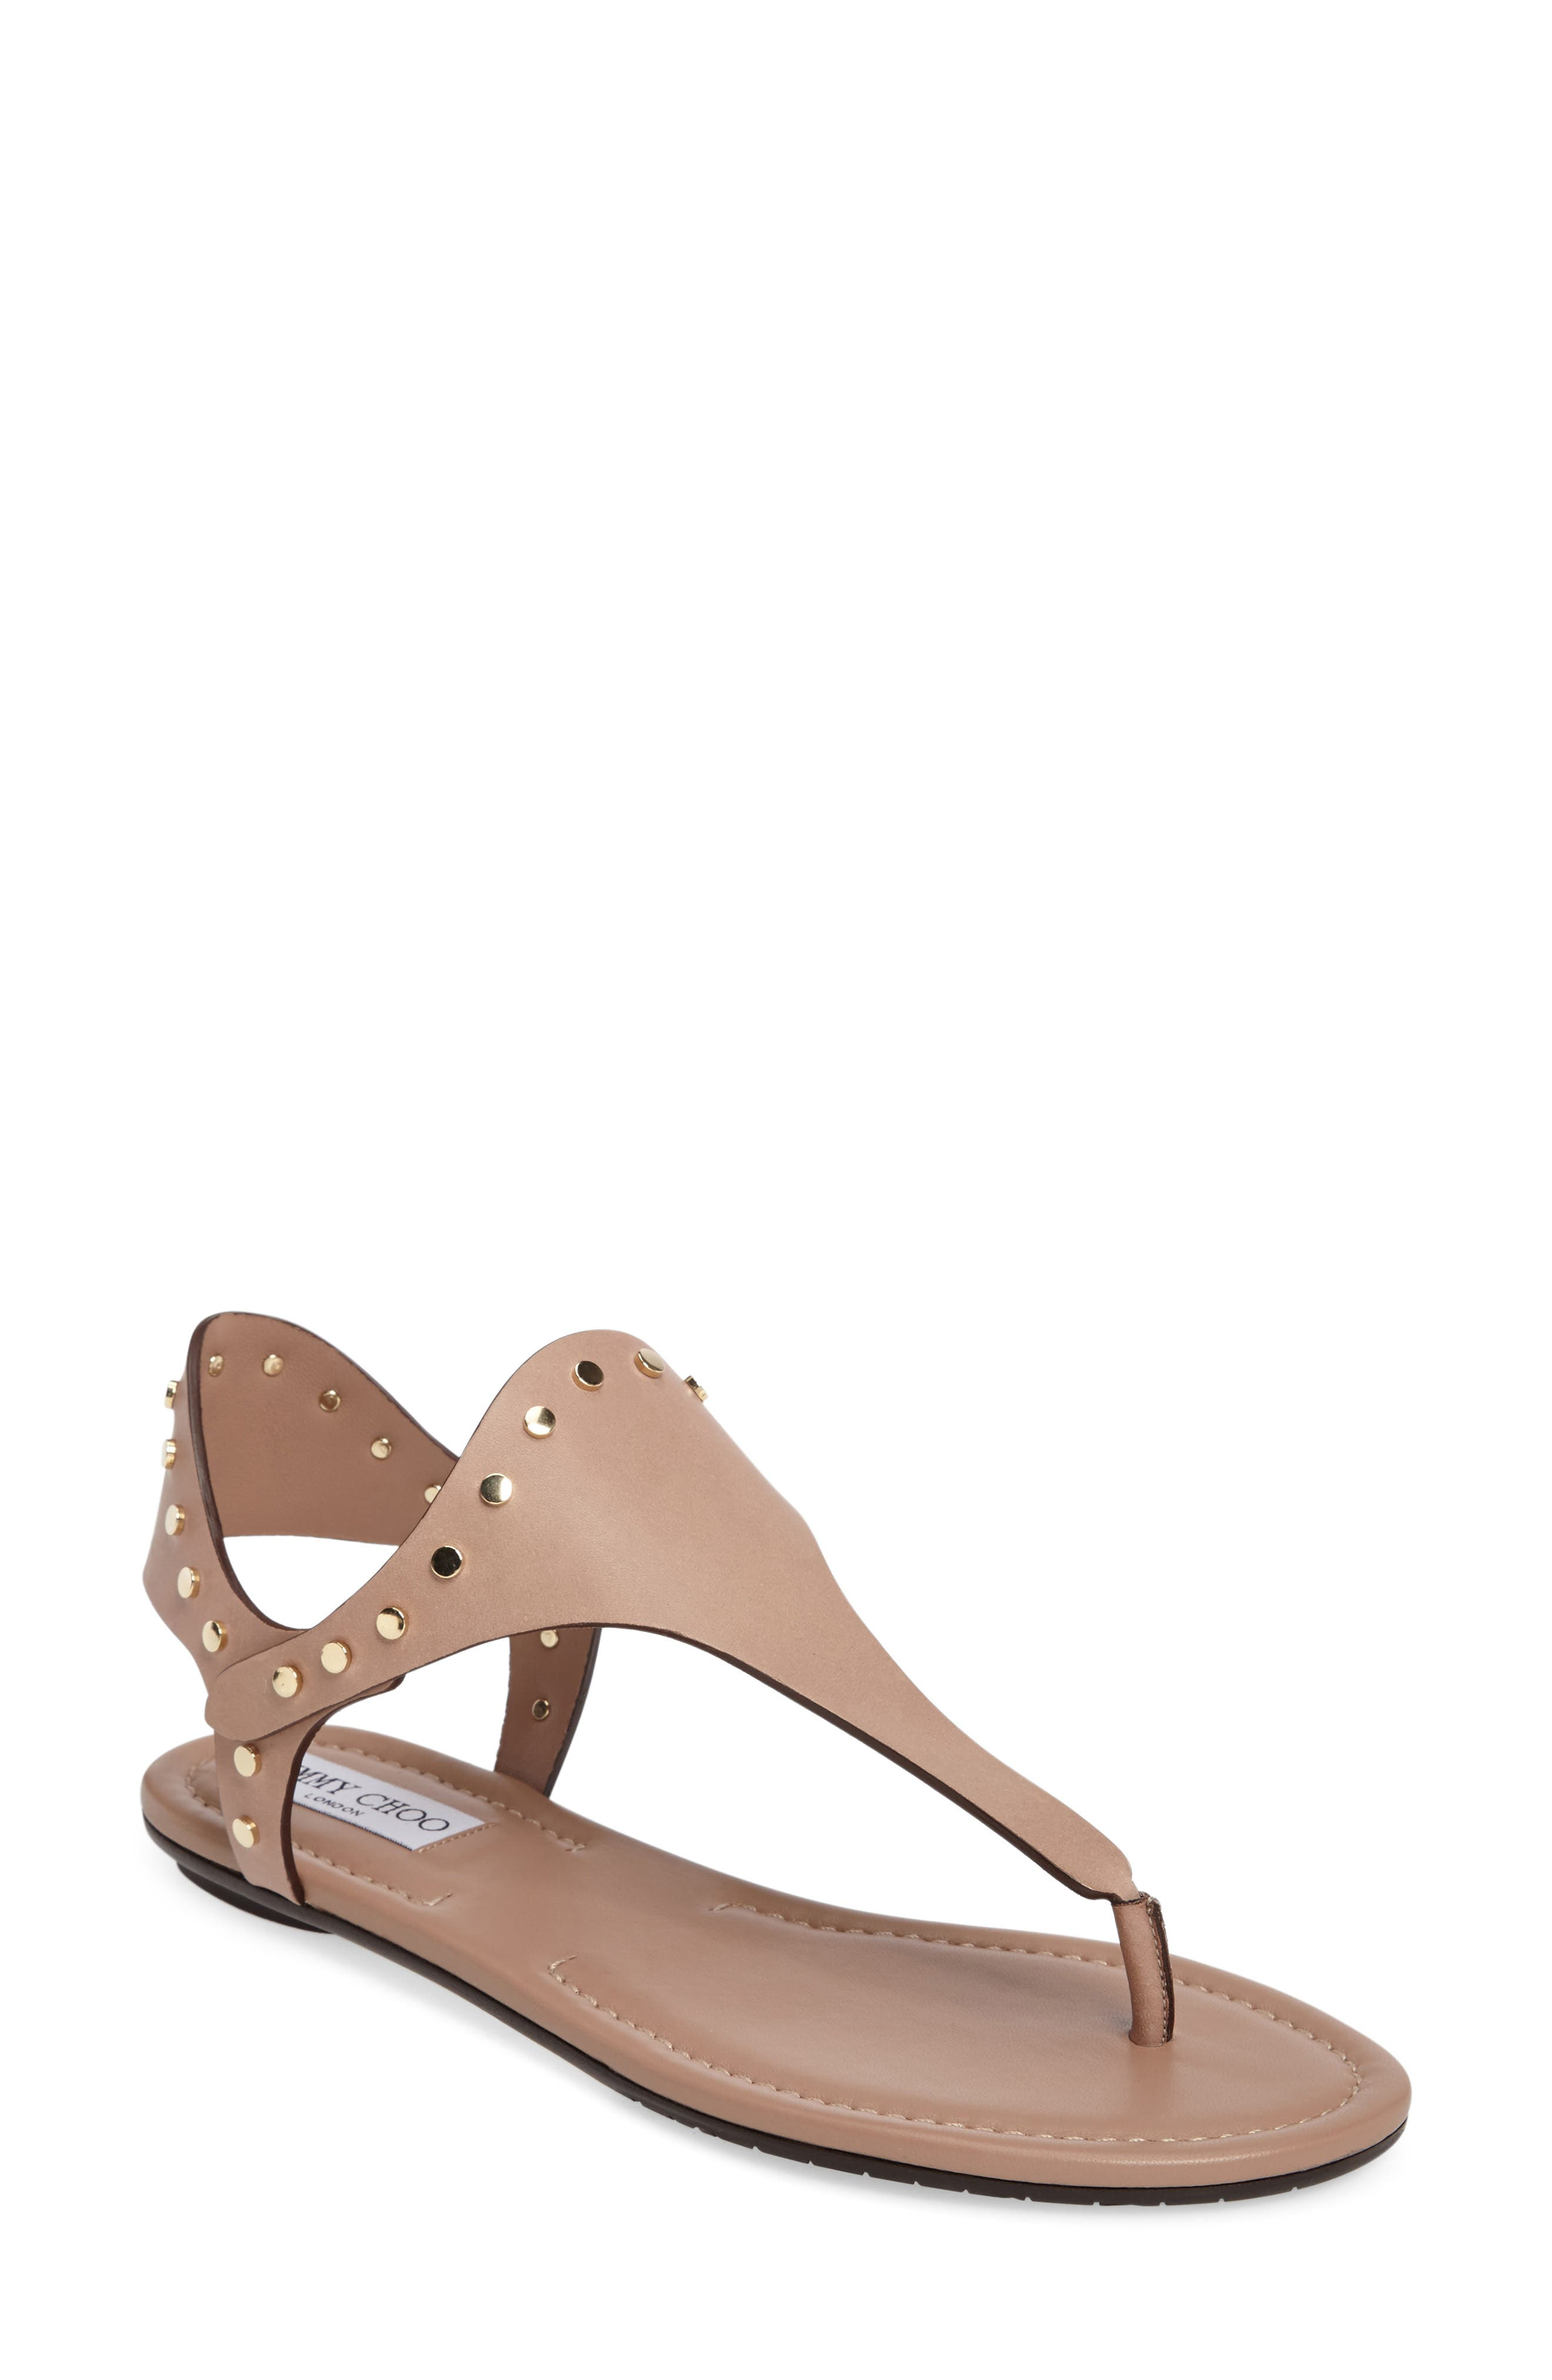 JIMMY CHOO Dara Studded T-Strap Sandal